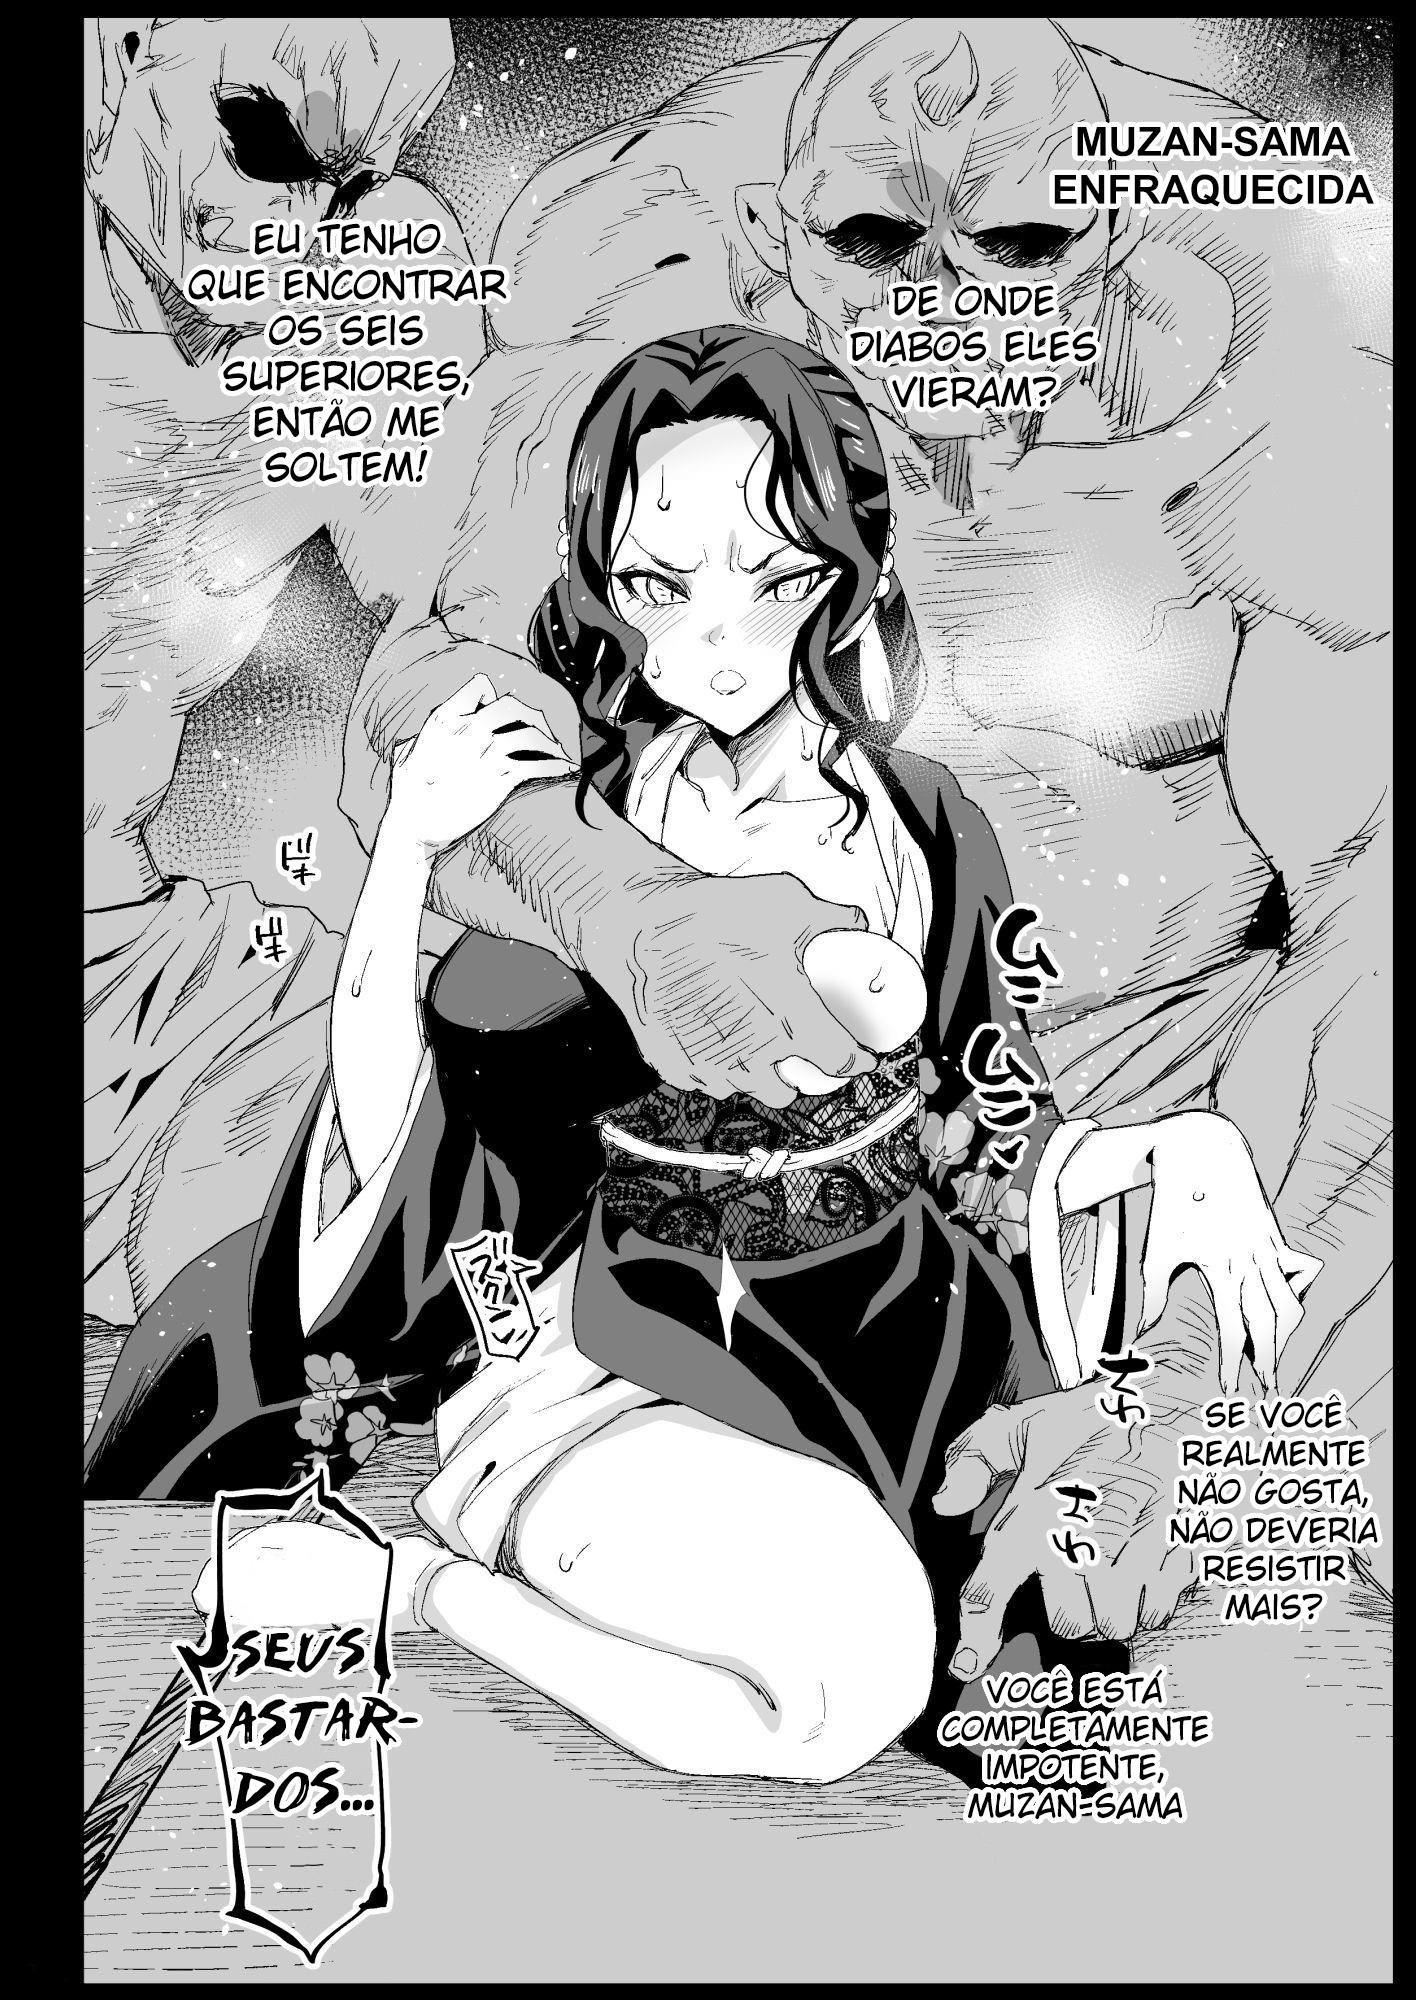 Estupro da caçadora de demônios 03